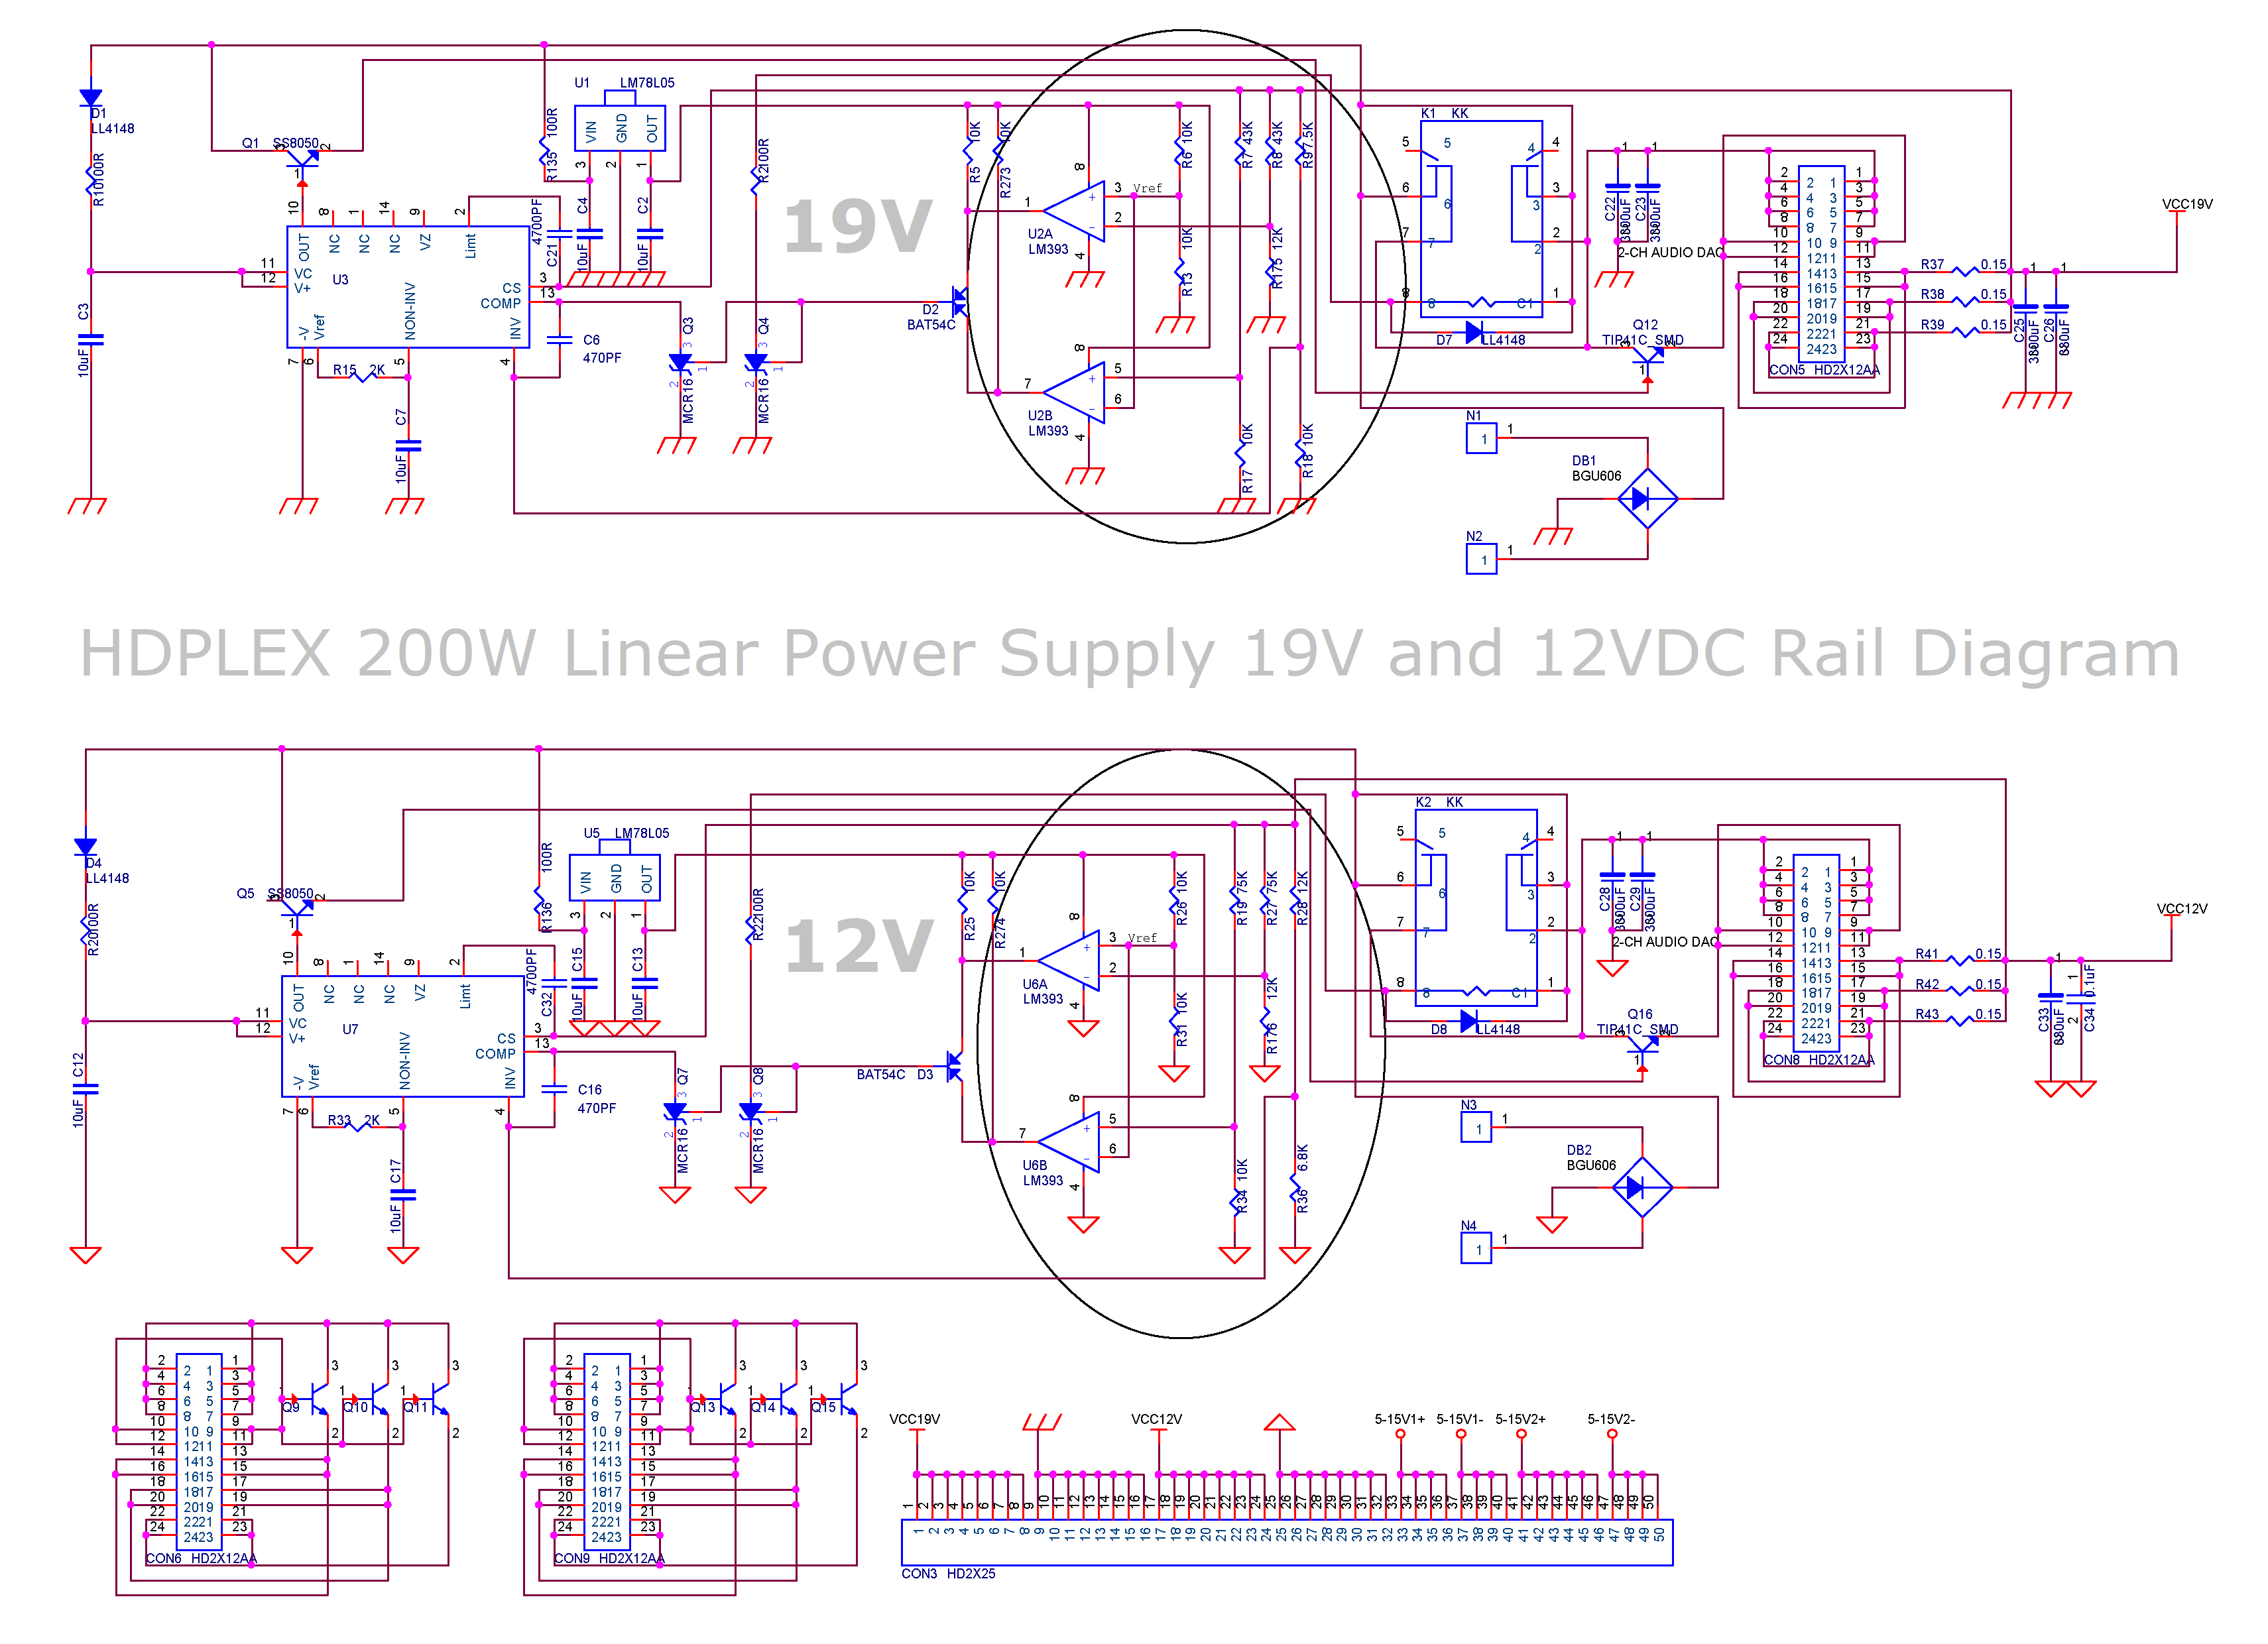 Hdplex 200w Linear Power Supply Multi Rail Output 400w Audio Amplifier Schema And Layout Psu Diagram